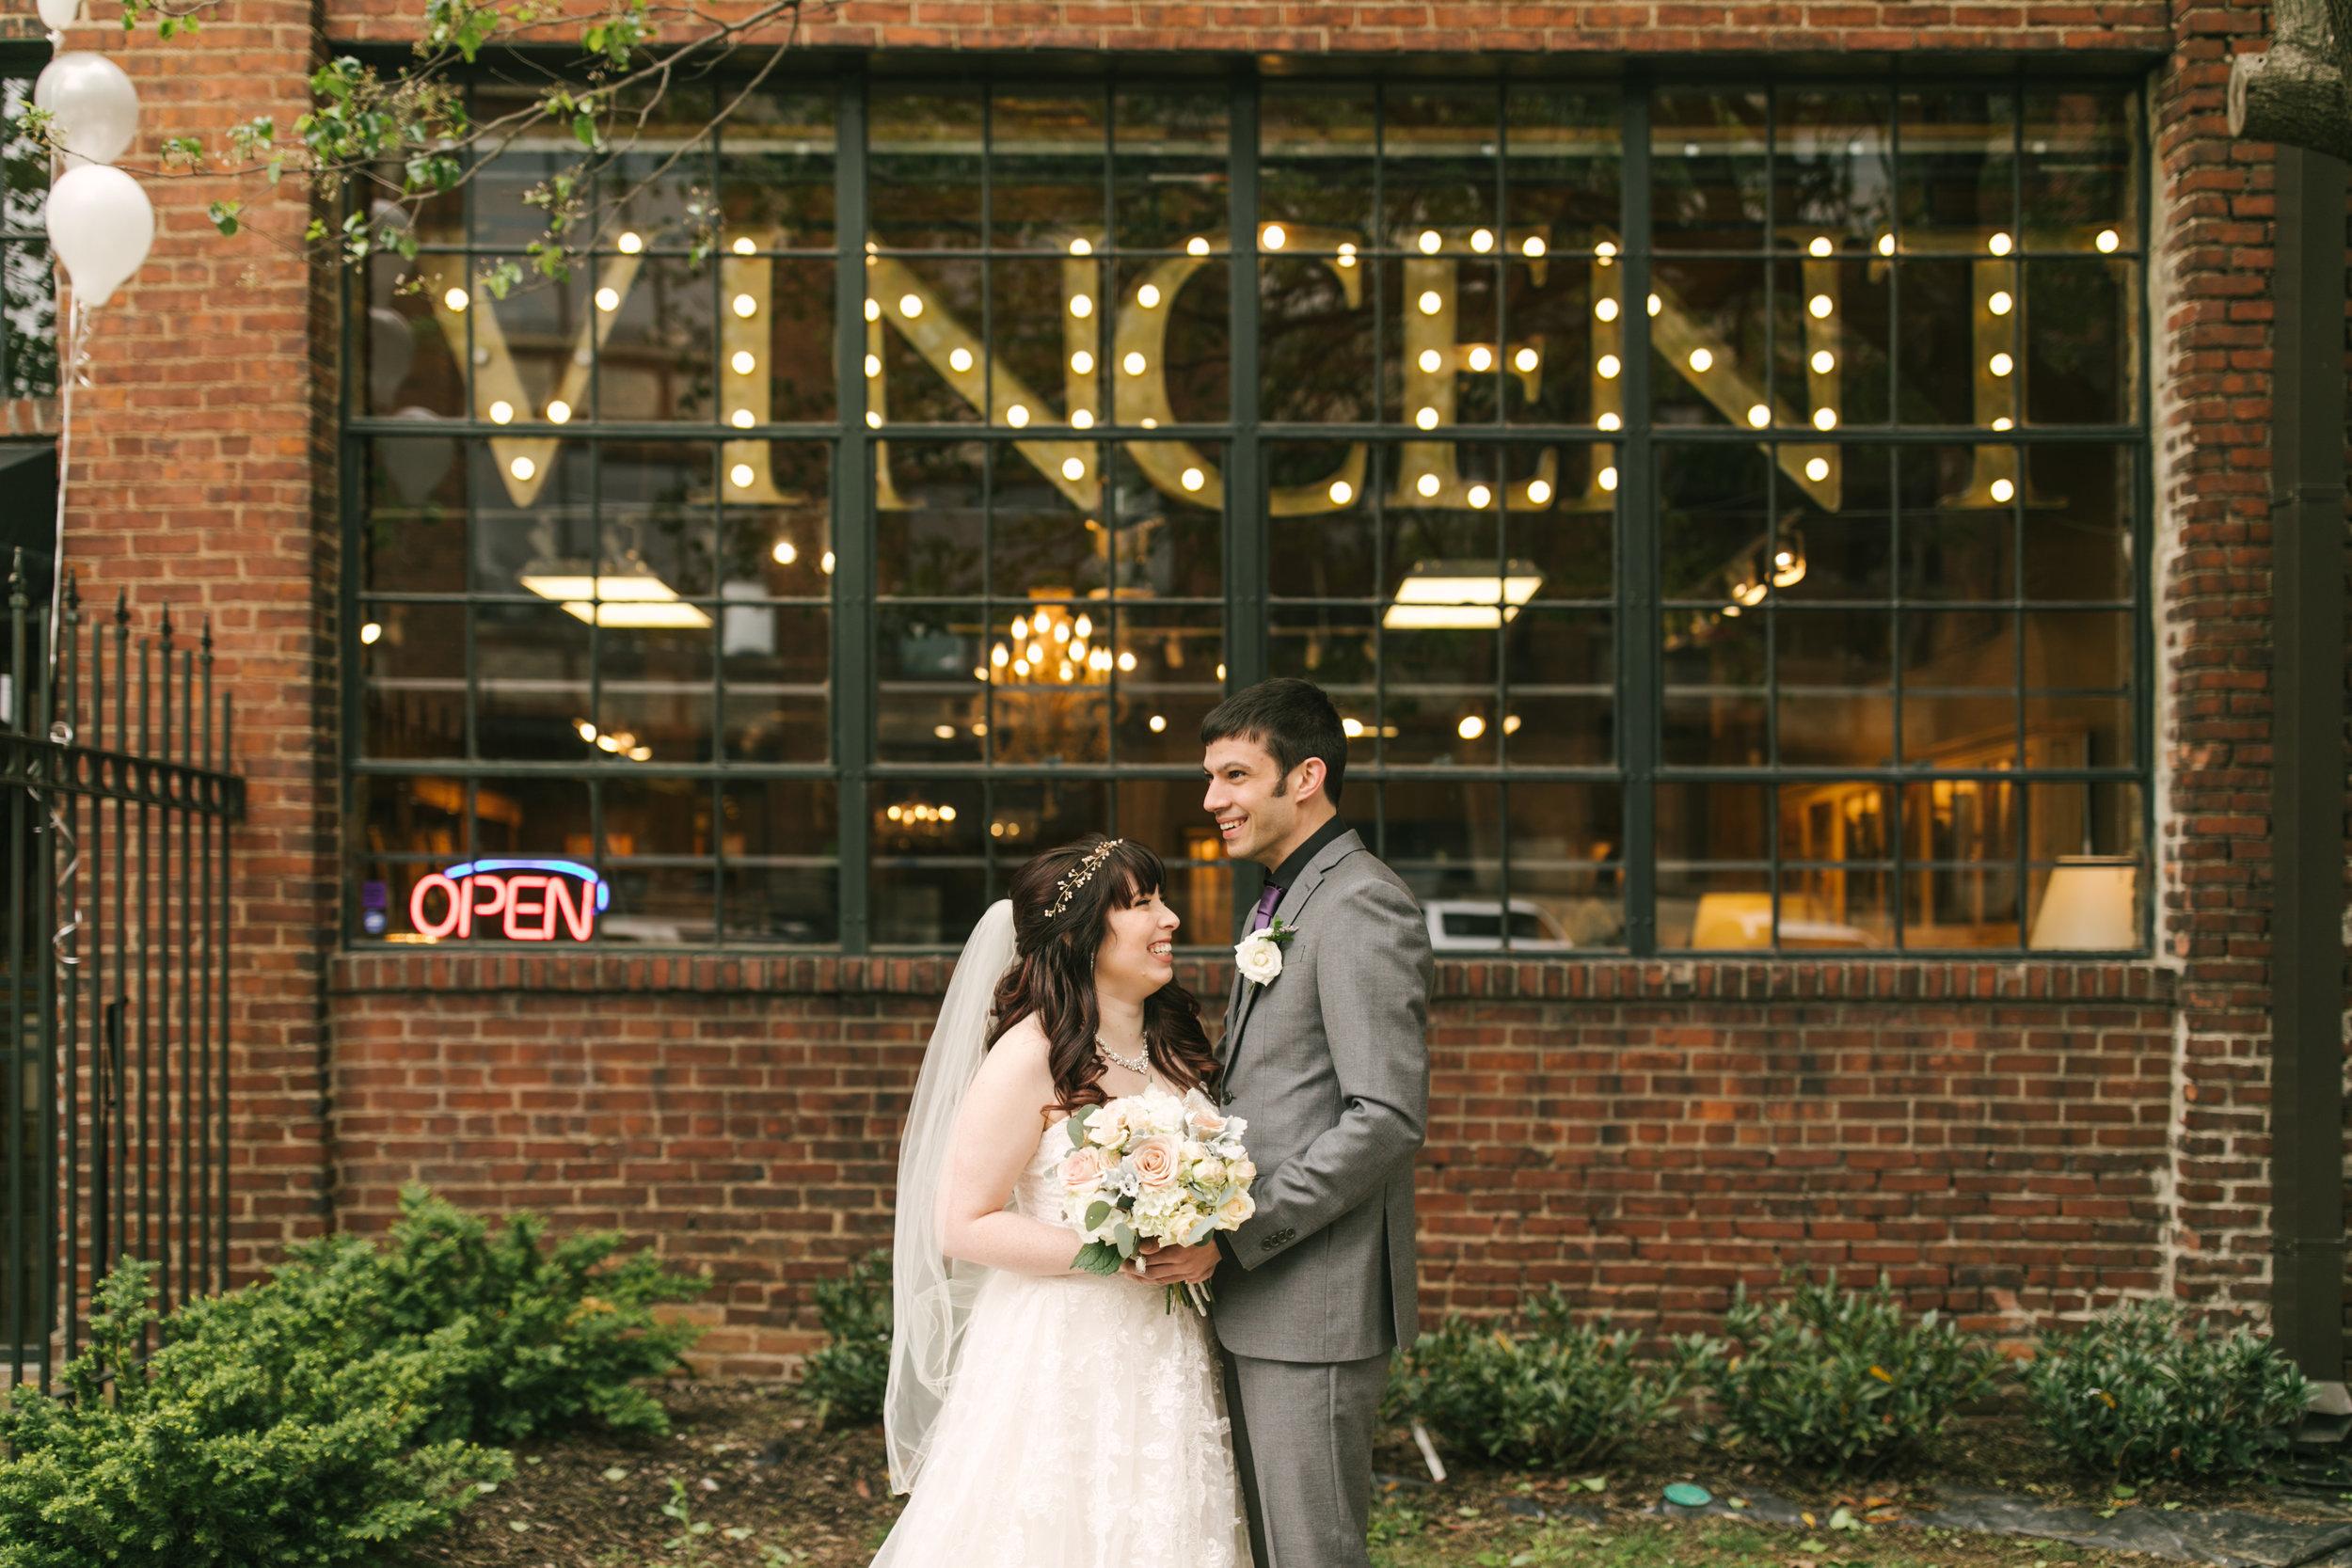 260_Colin+Jessica_Wedding.jpg